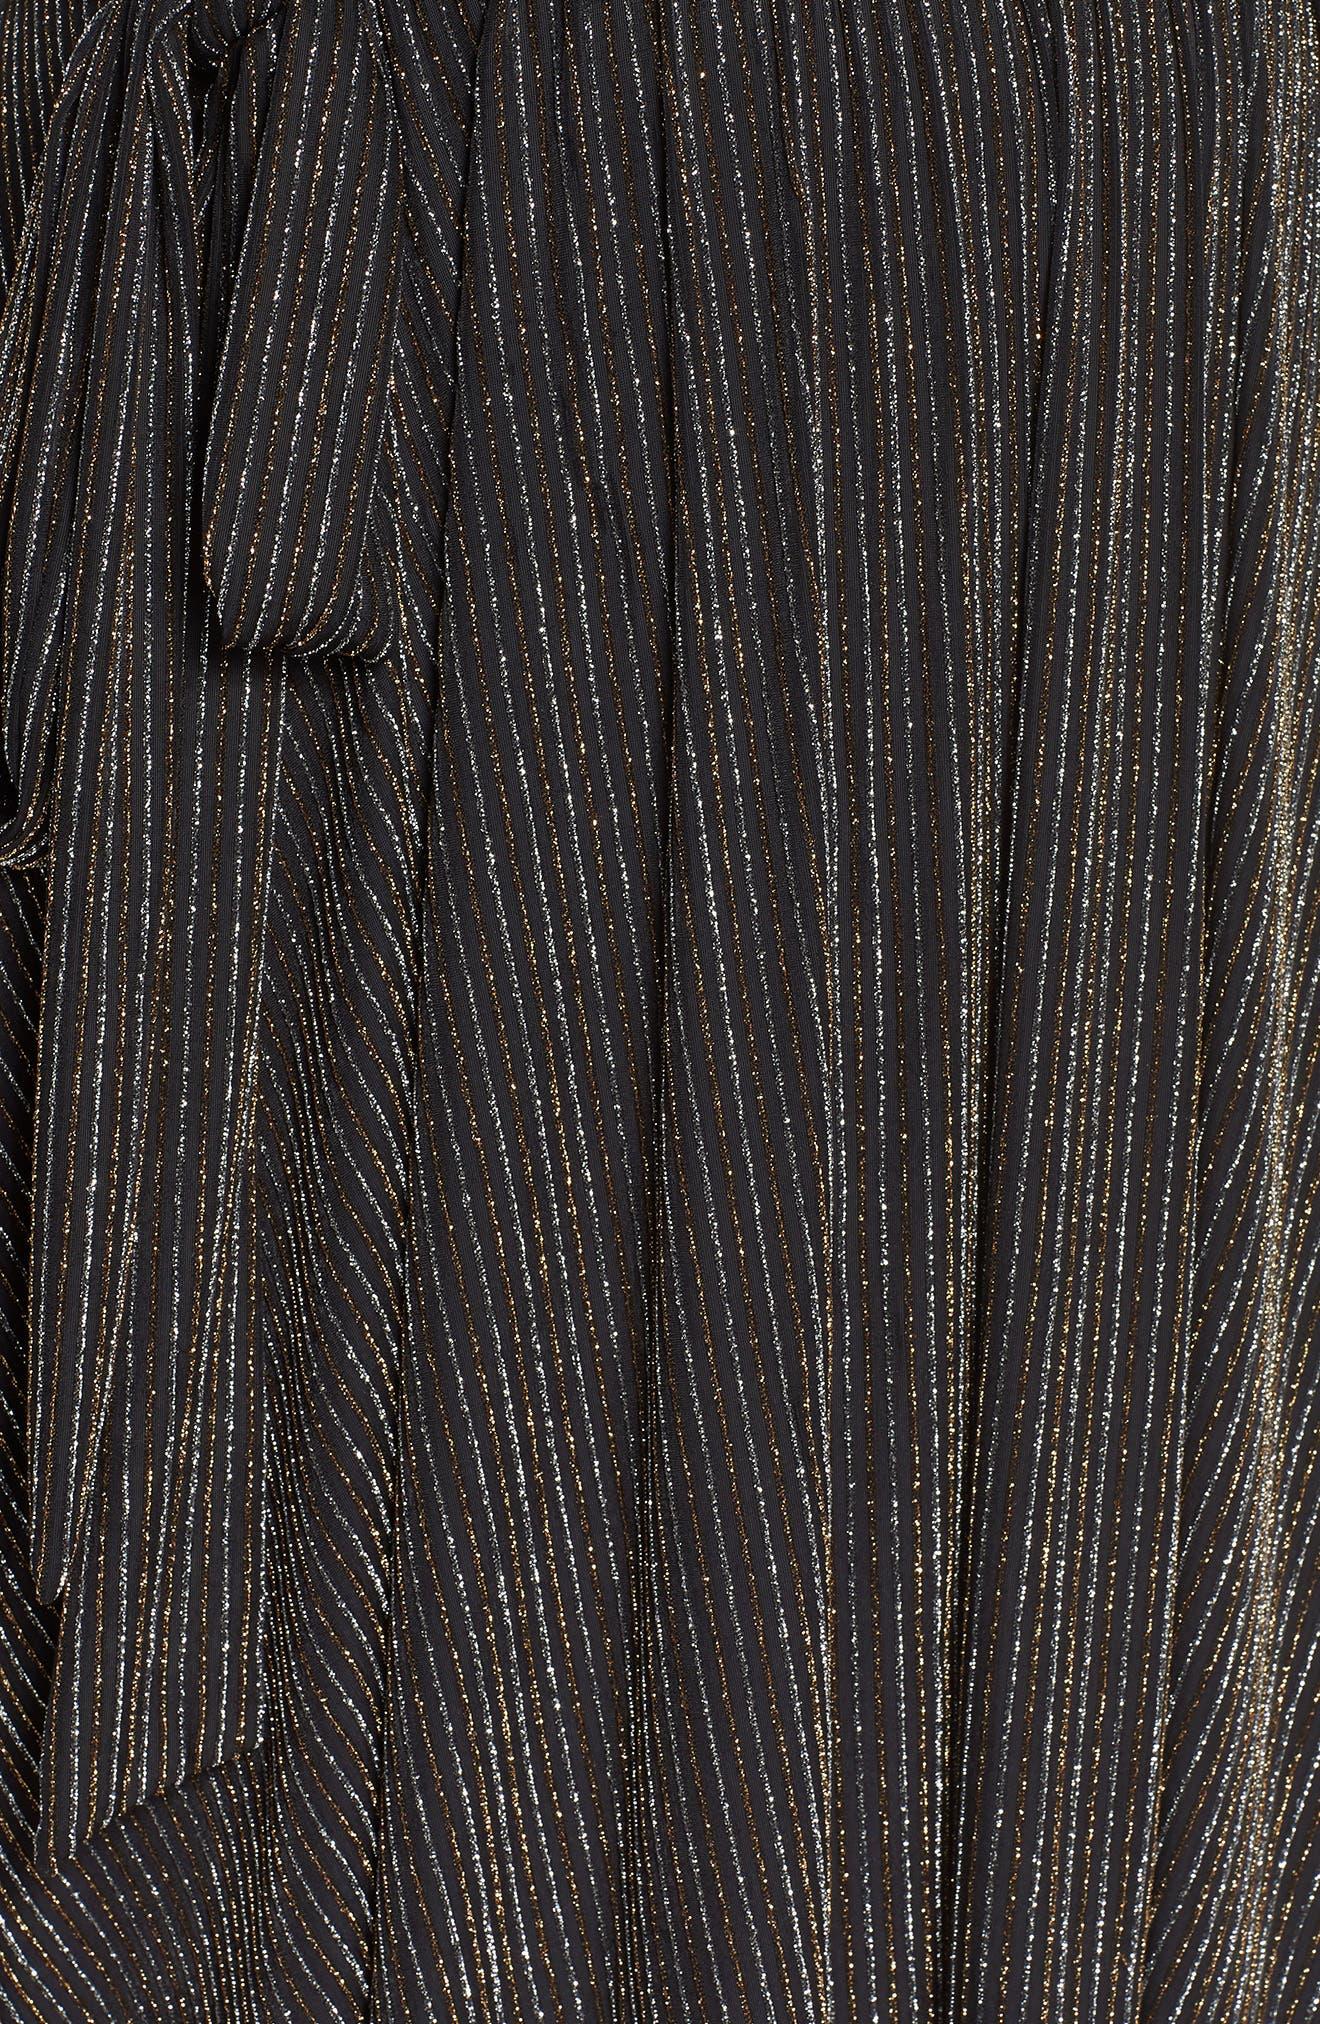 CHELSEA28,                             Metallic Tie Waist Dress,                             Alternate thumbnail 4, color,                             001